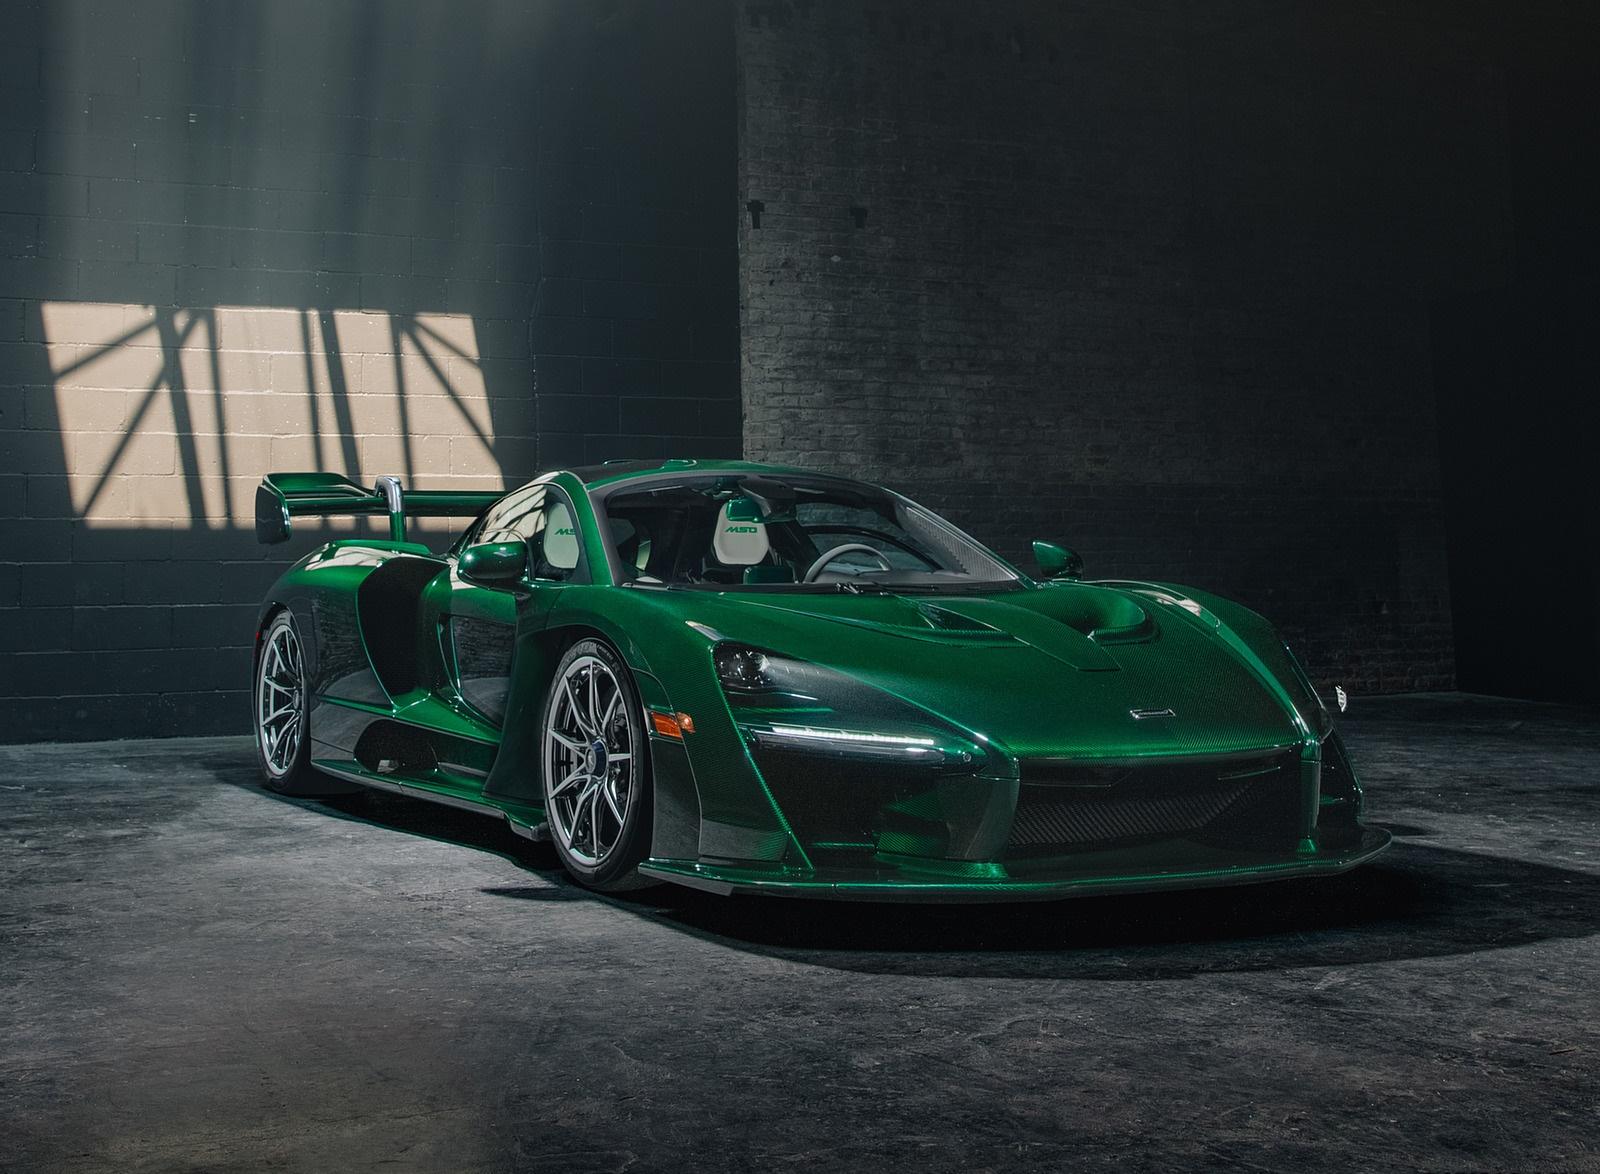 2019 Mclaren Senna Color Emerald Green Front Three